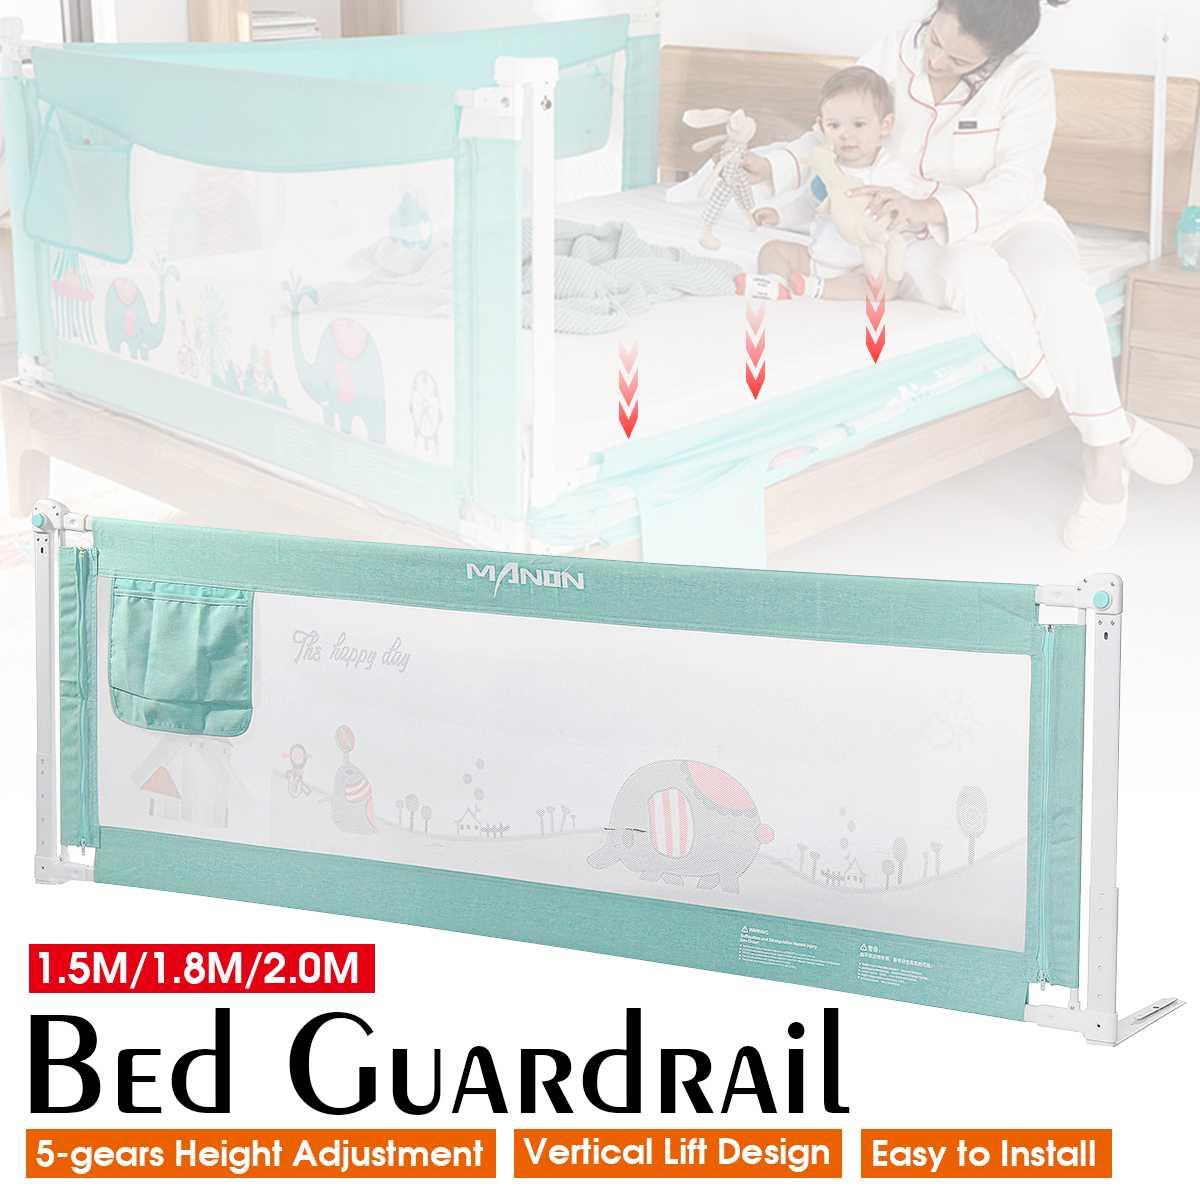 1.5m/1.8m/2m Baby Playpen Bed Fence Safety Rails For Children Infants Kids Adjustable Bedding Crib Barrier Bed Guardrail